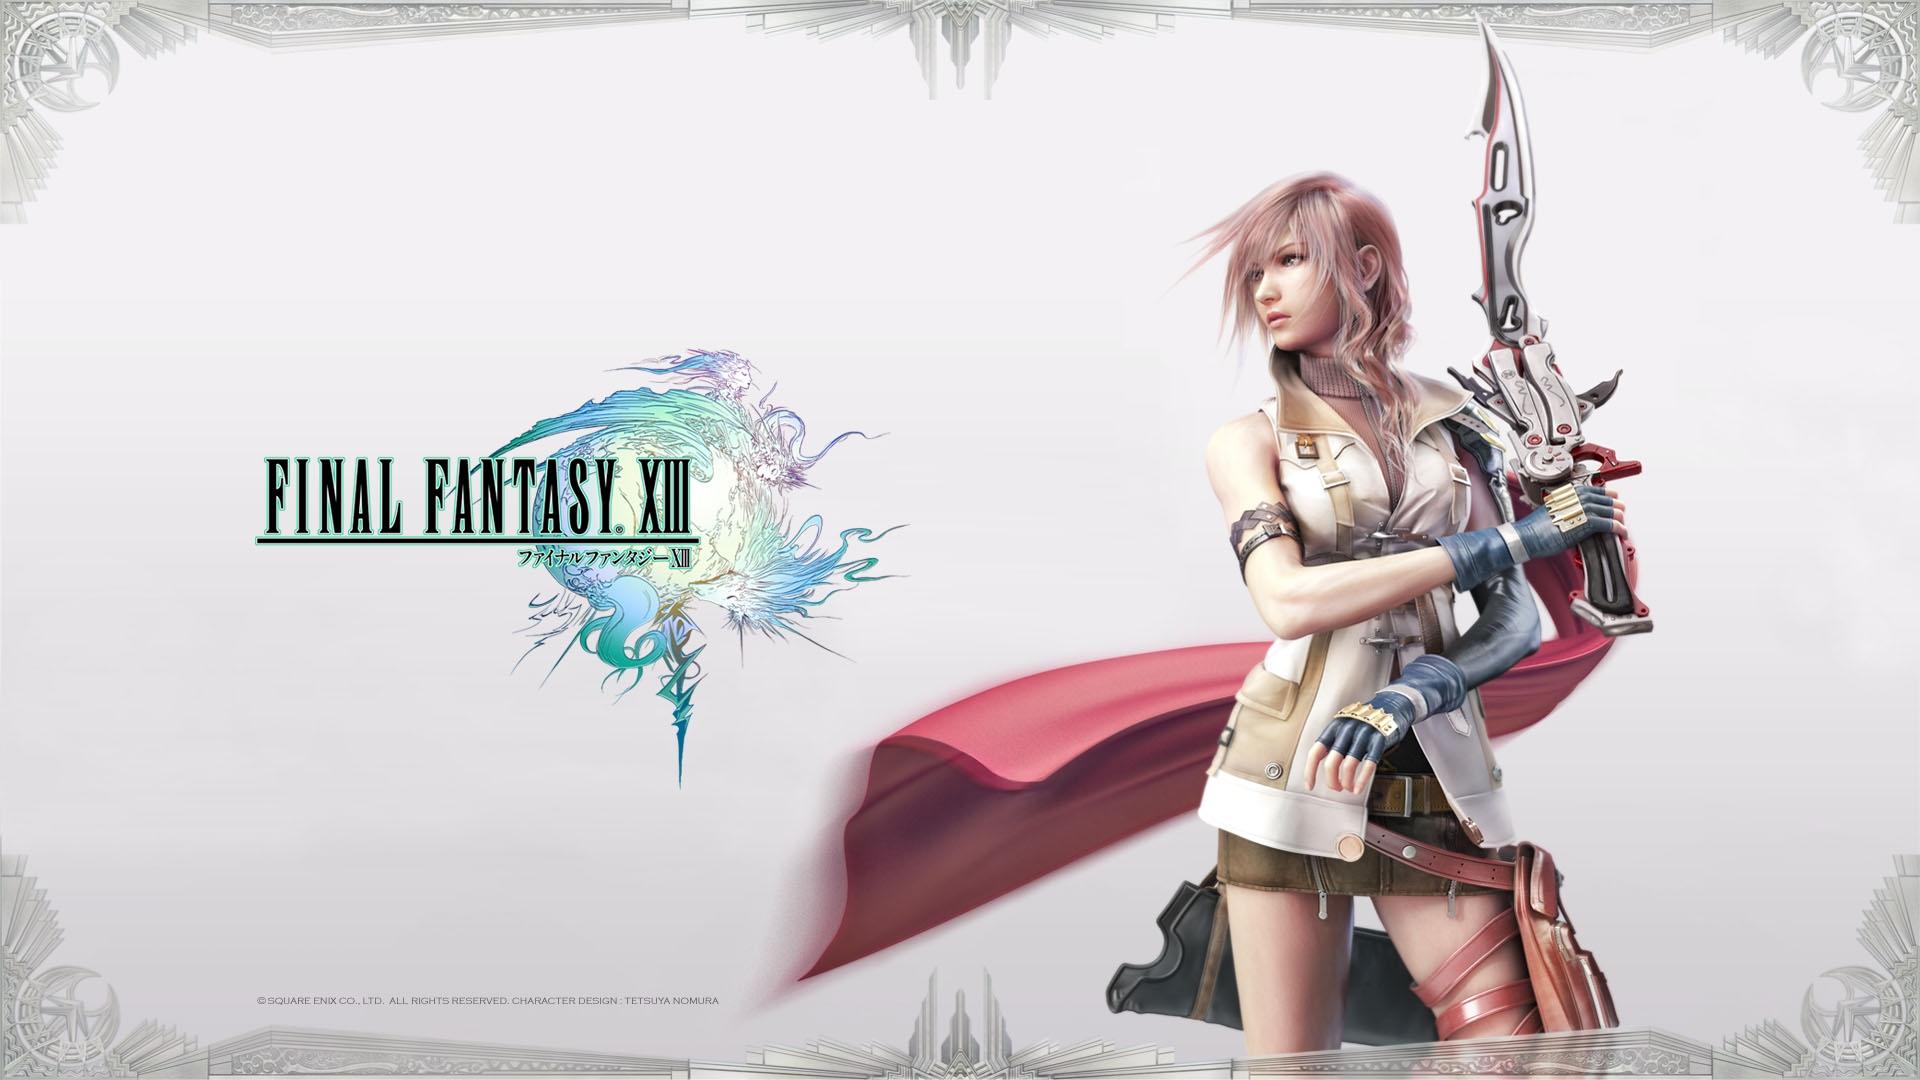 35323ab711 dibujo ilustración rubia Anime relámpago dibujos animados espada Final  Fantasy XIII niña bosquejo captura de pantalla